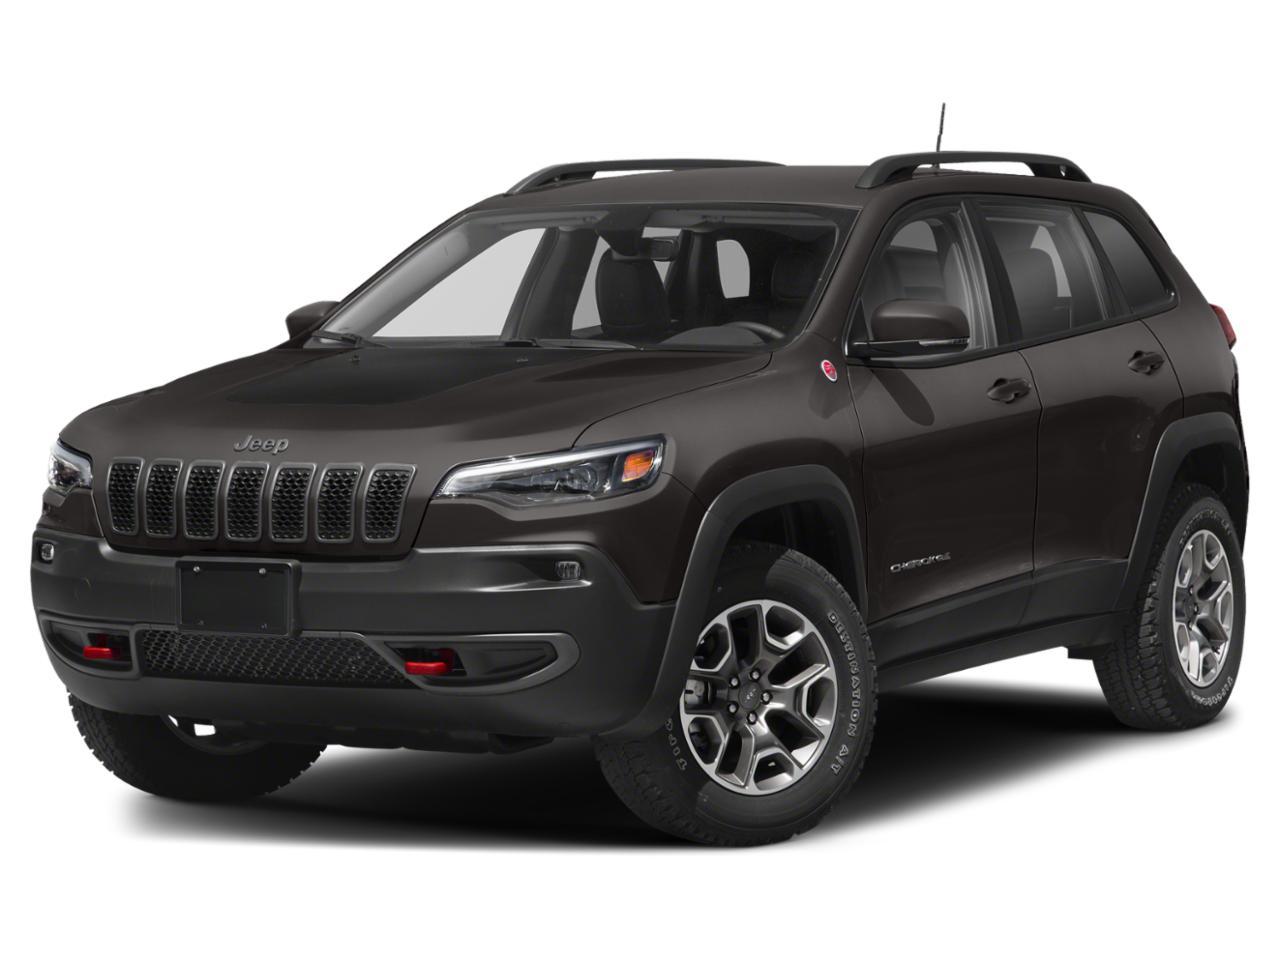 2019 Jeep Cherokee Vehicle Photo in CARLSBAD, CA 92008-4399